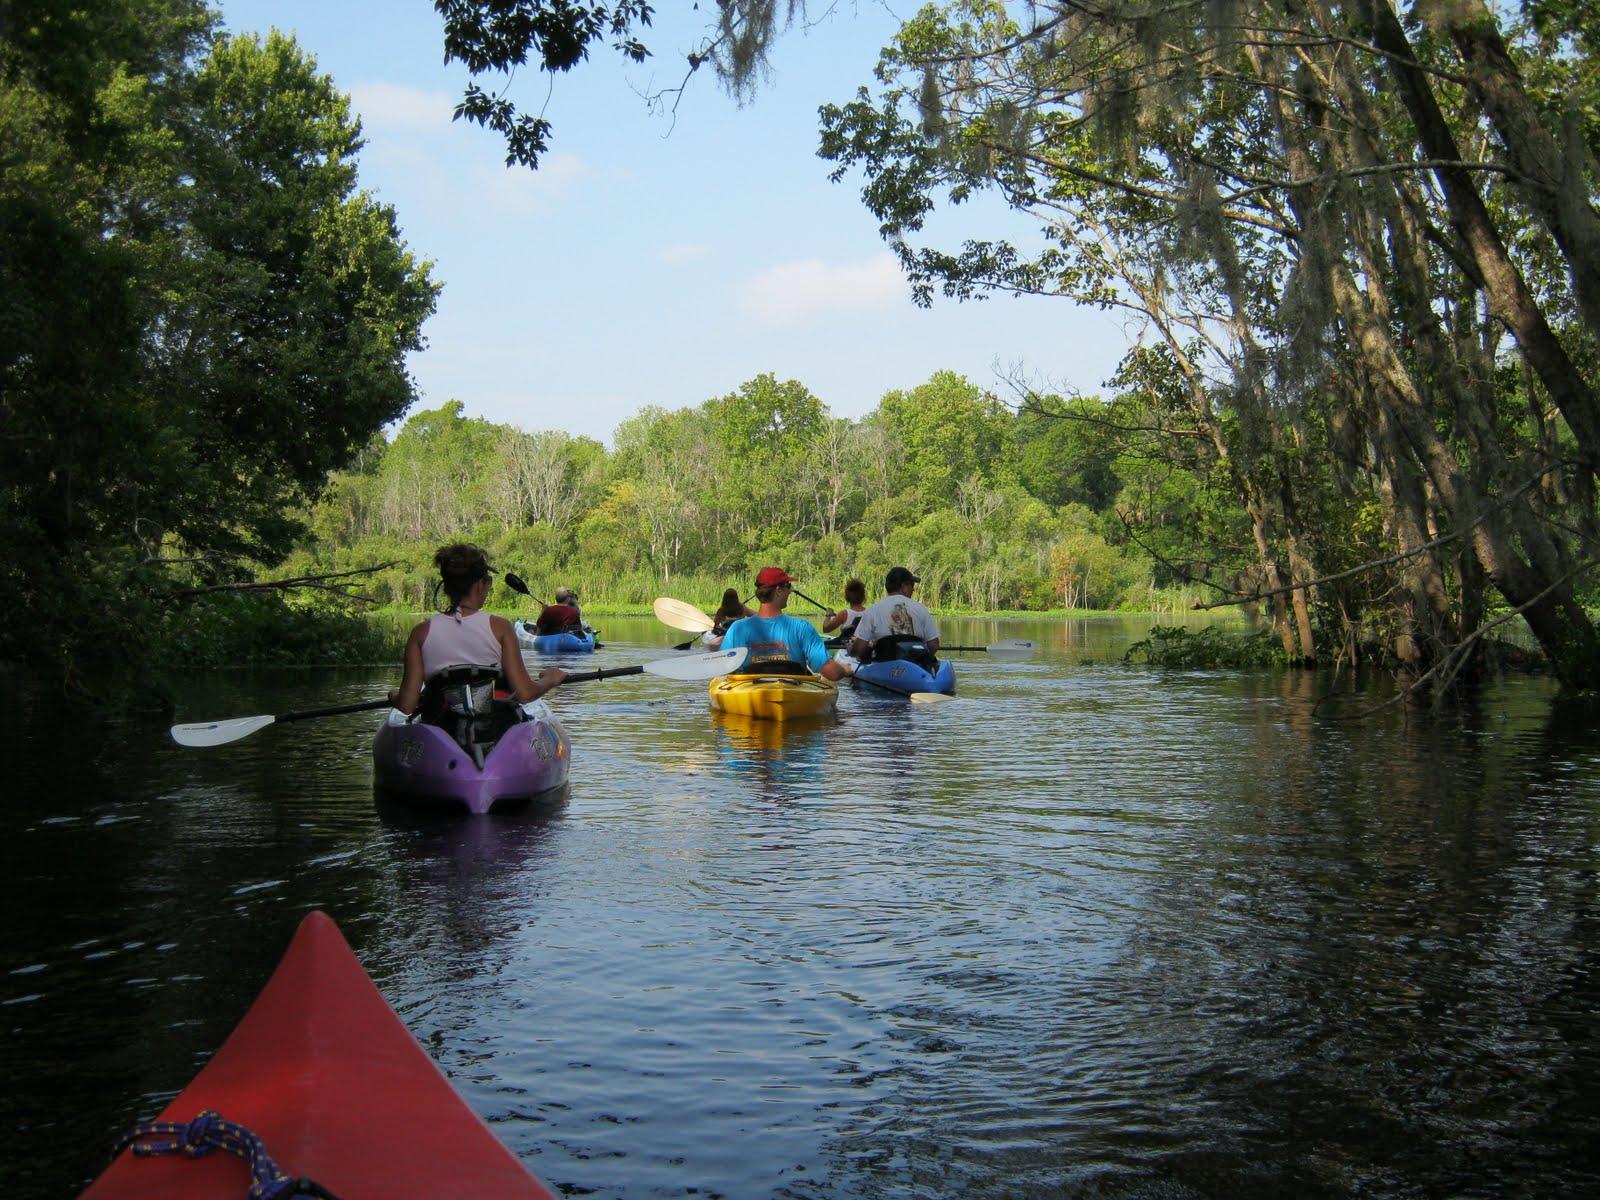 Wekiva River Monkeys Paddled The Wekiva River